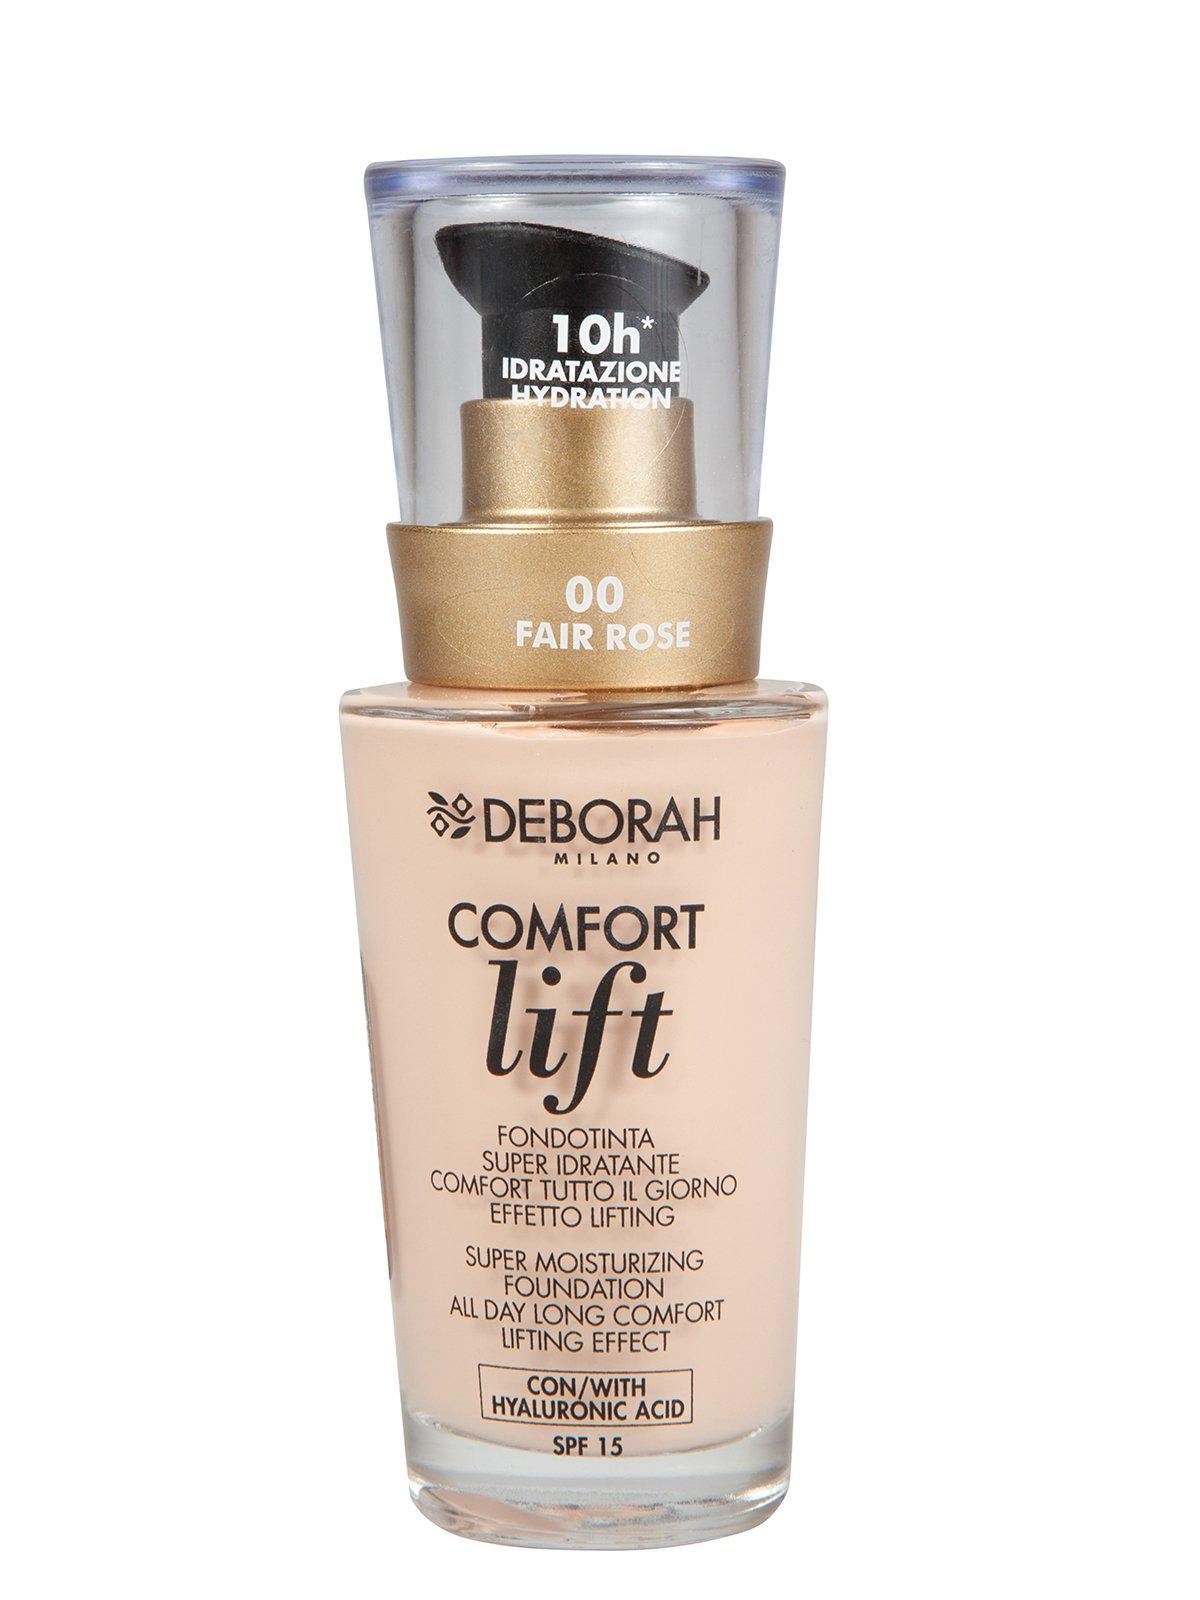 Тональна основа вельветова Comfort Lift № 00 (30 мл)   352219